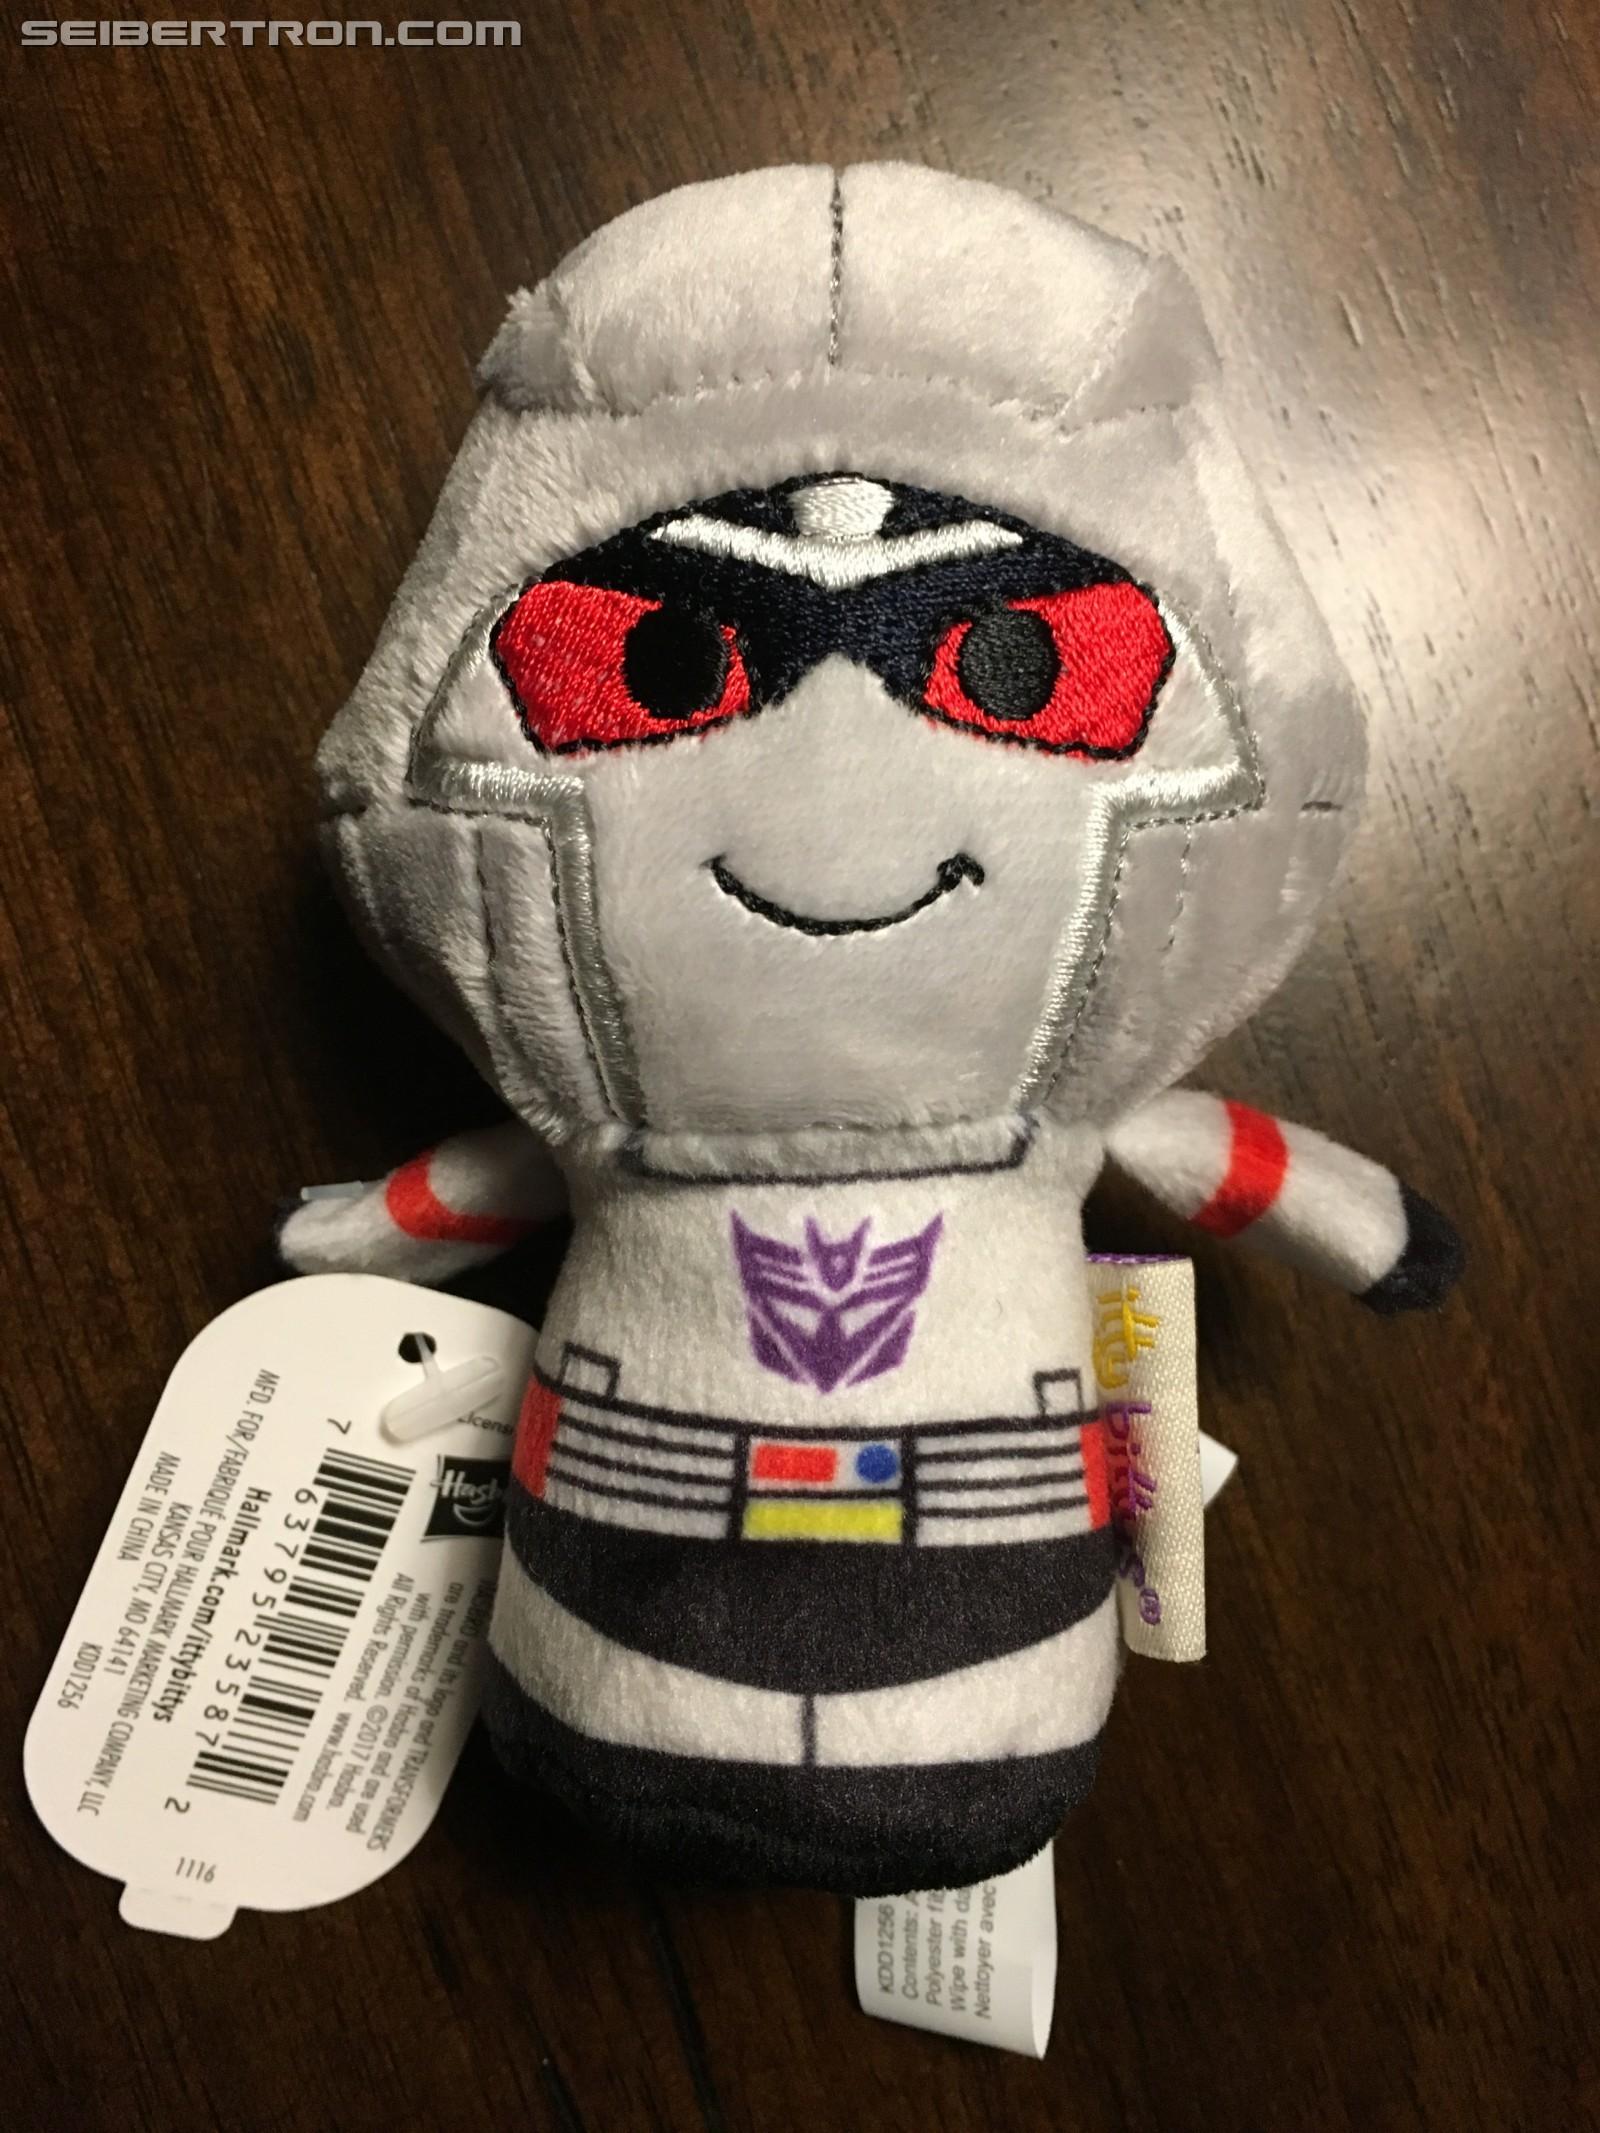 Transformers News: Re: Itty Bittys